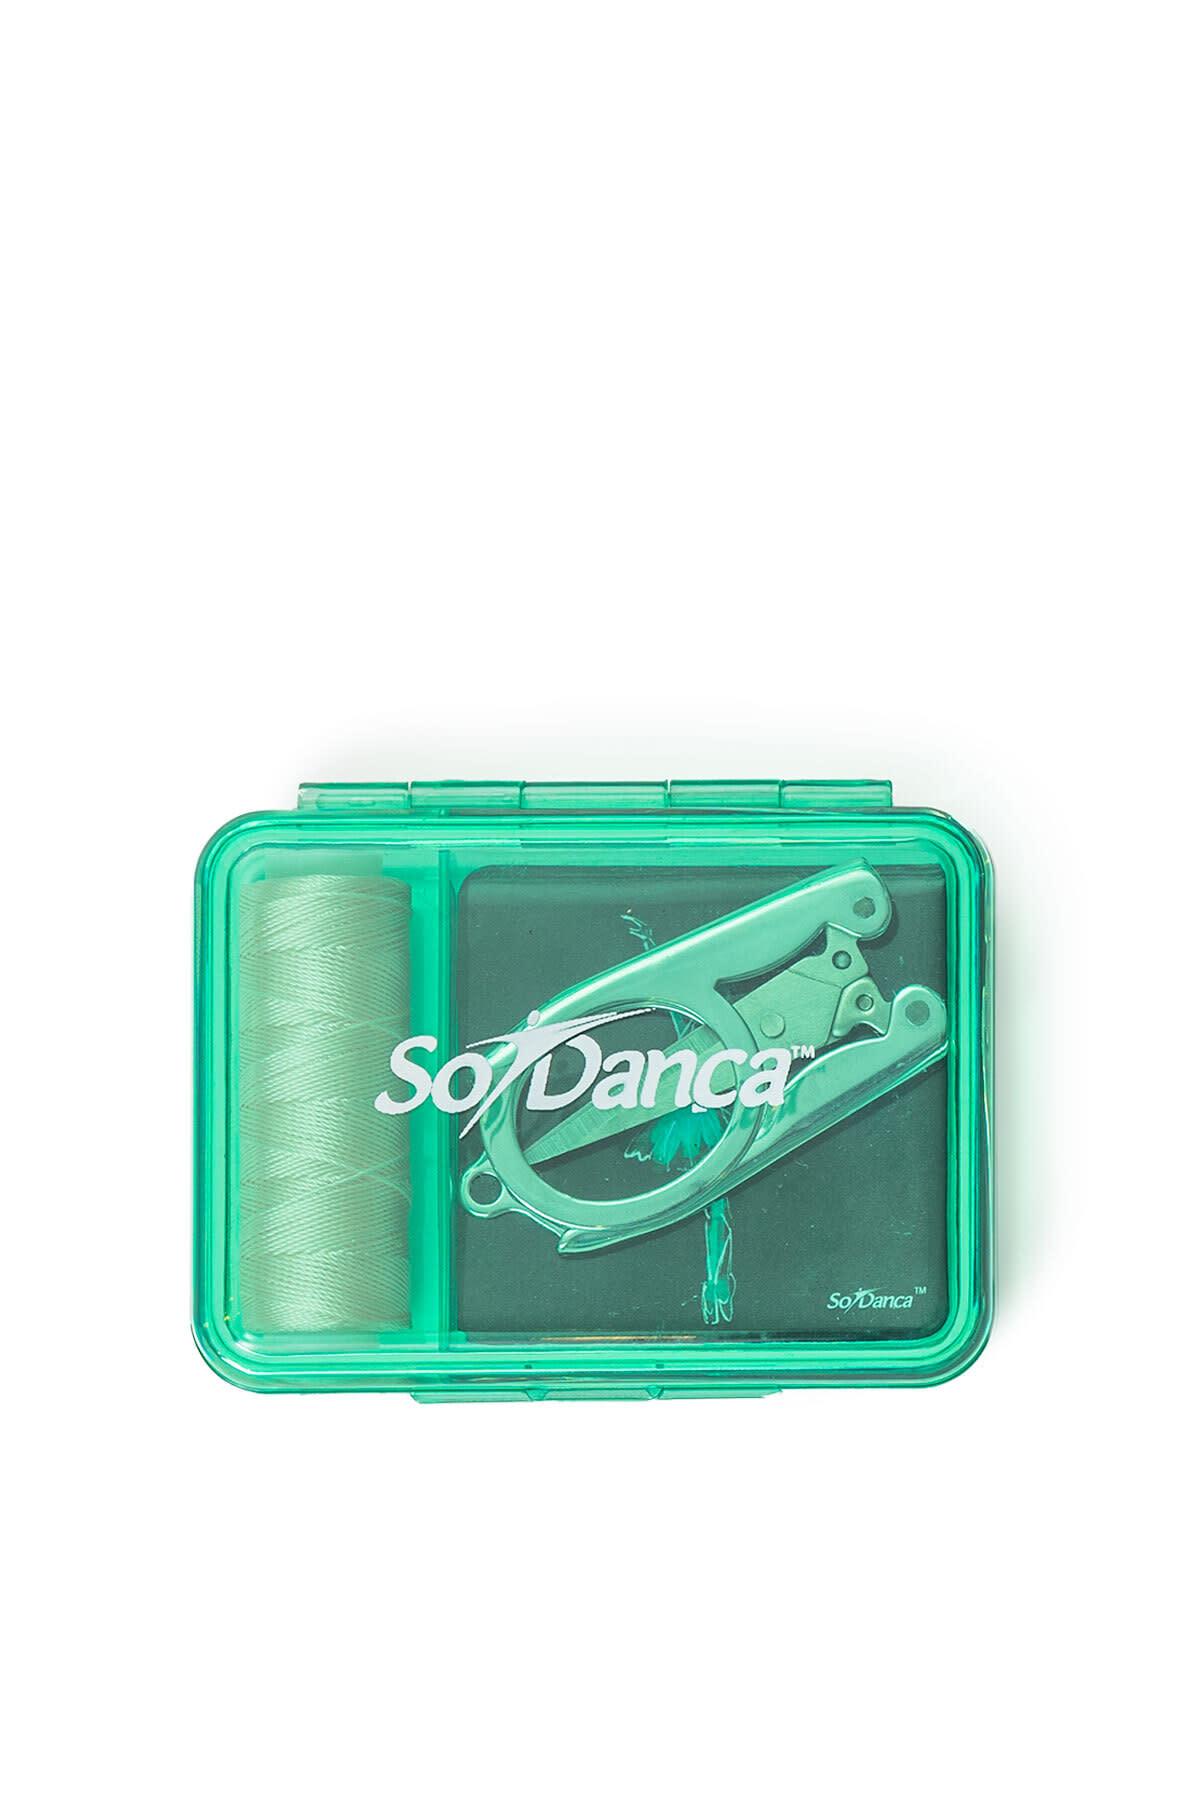 So Danca ST01 Stitch Kit